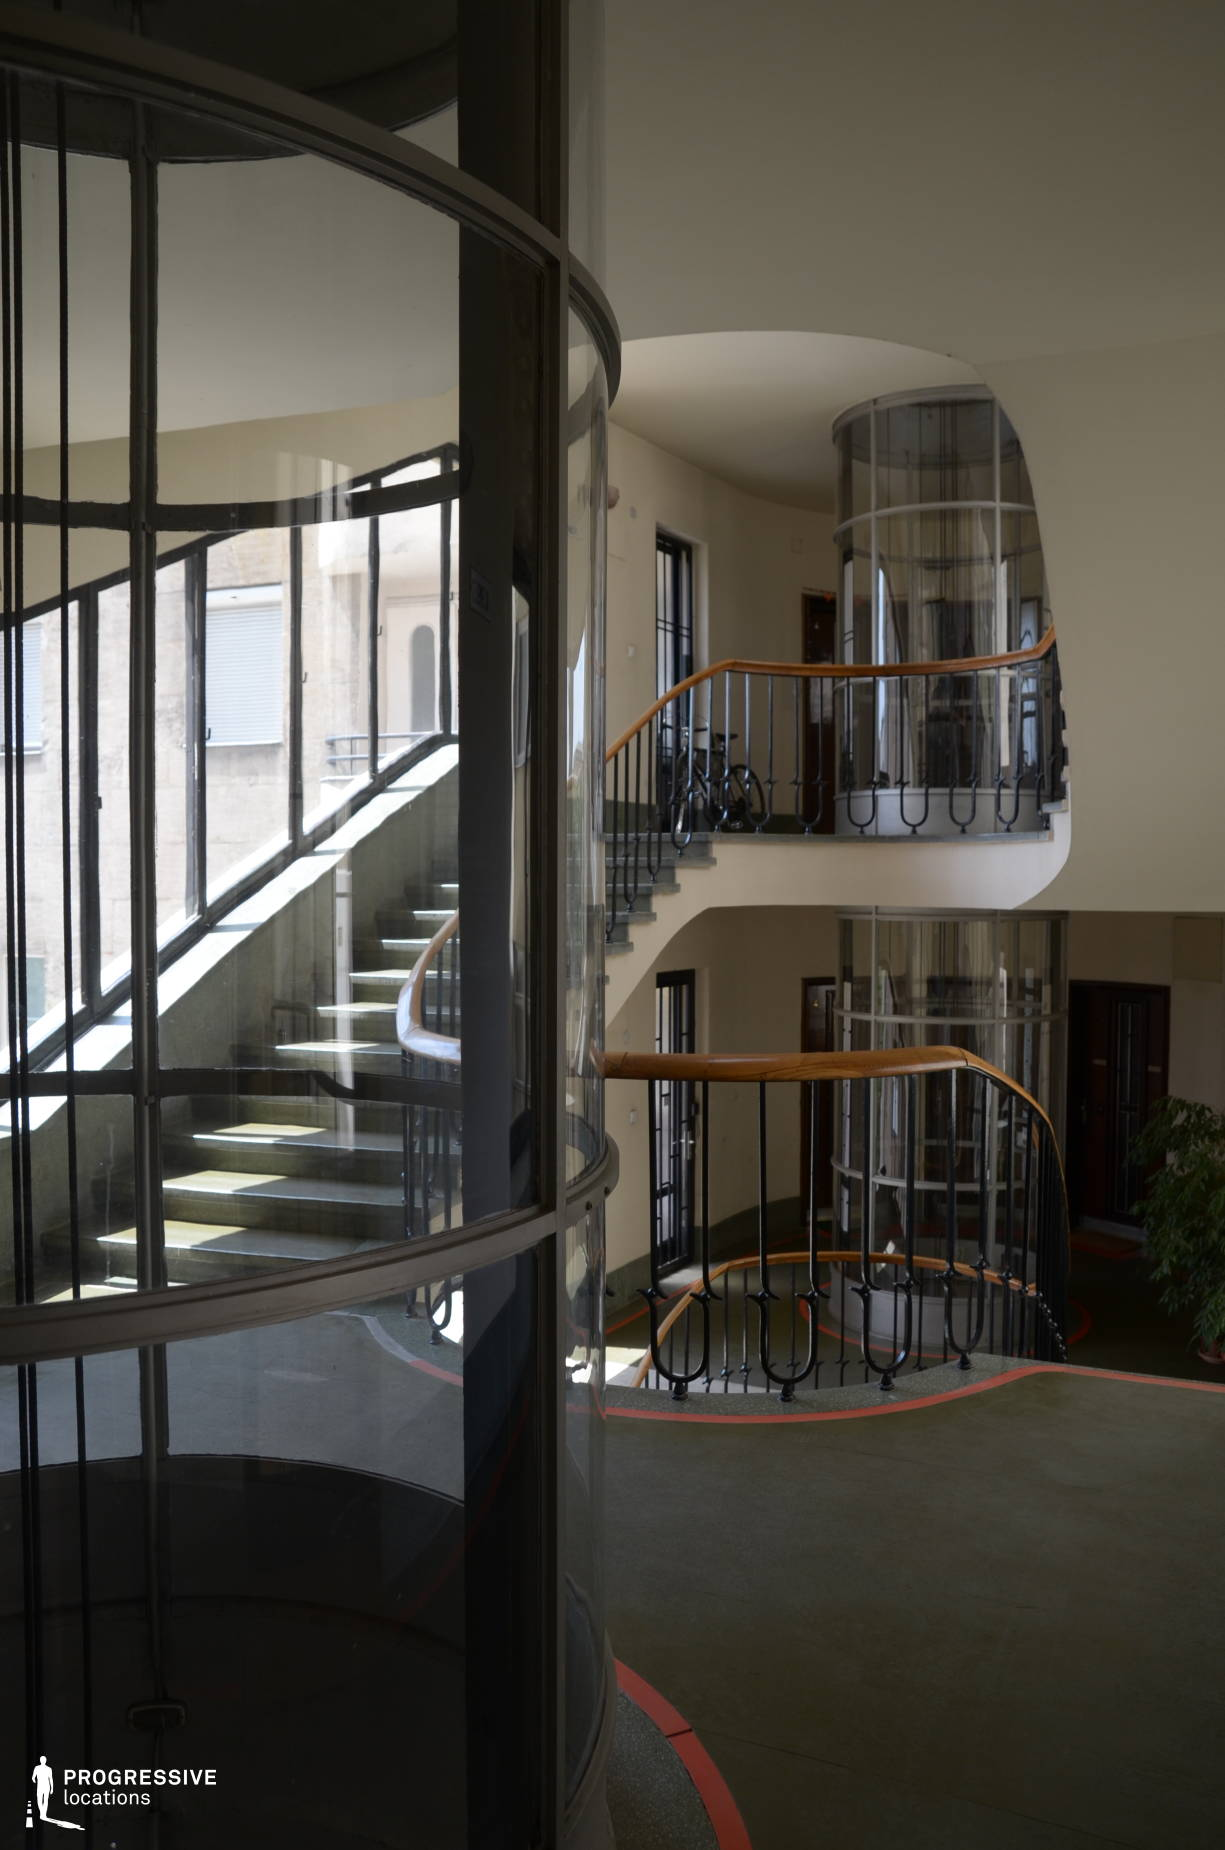 Locations in Budapest: Plexi %26 Glass Evevator, Margit Street